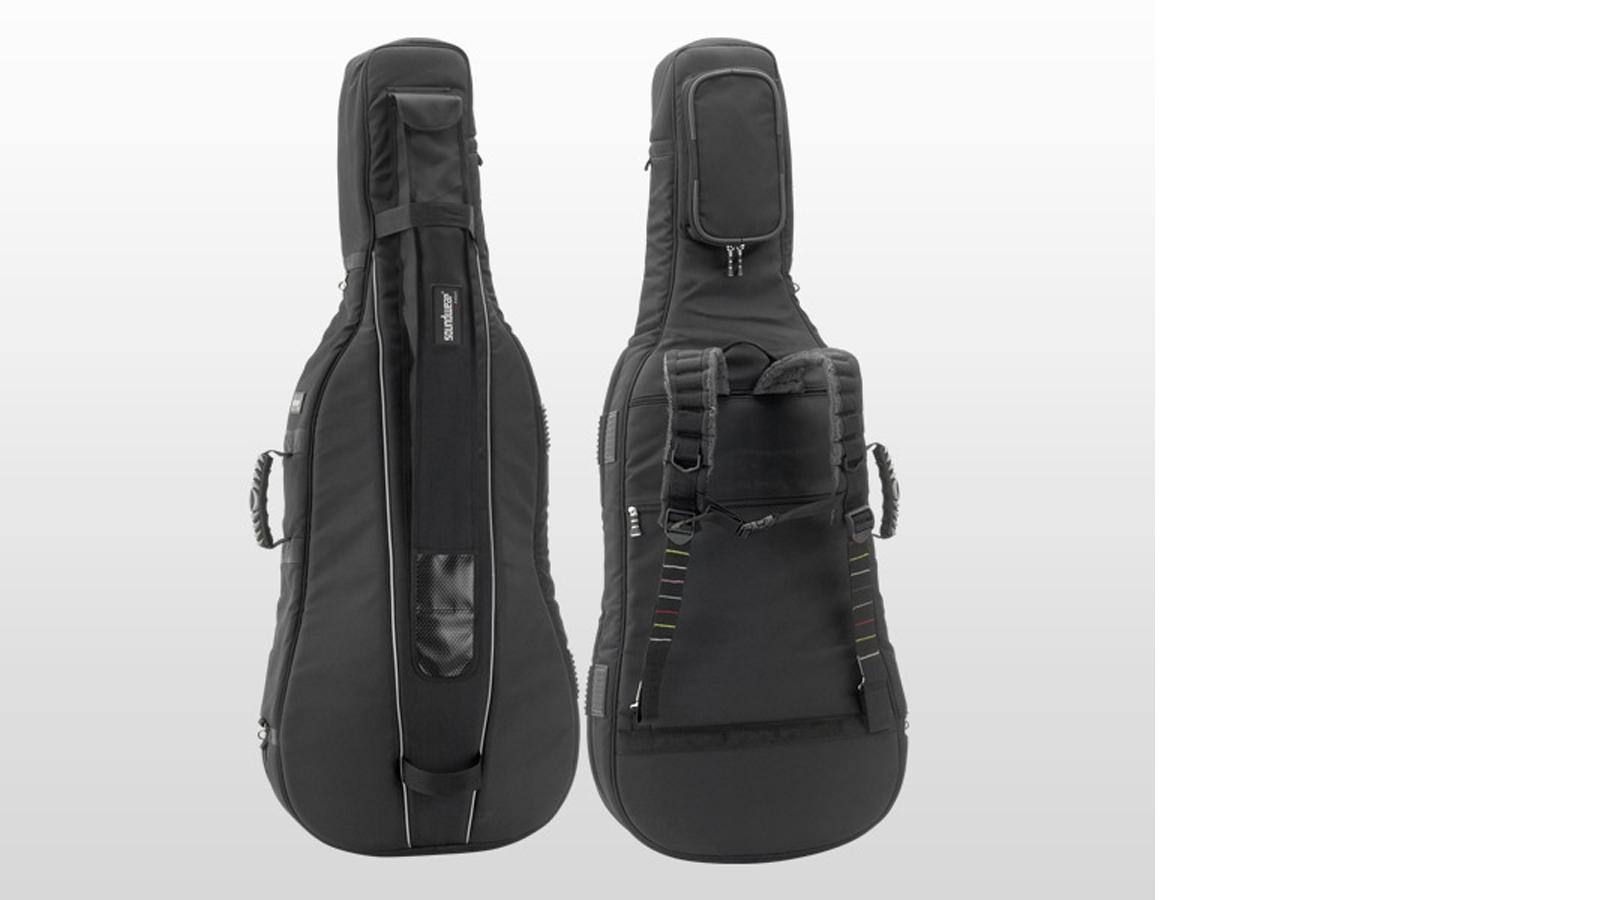 Soundwear Cello Tasche Protector schwarz 3/4